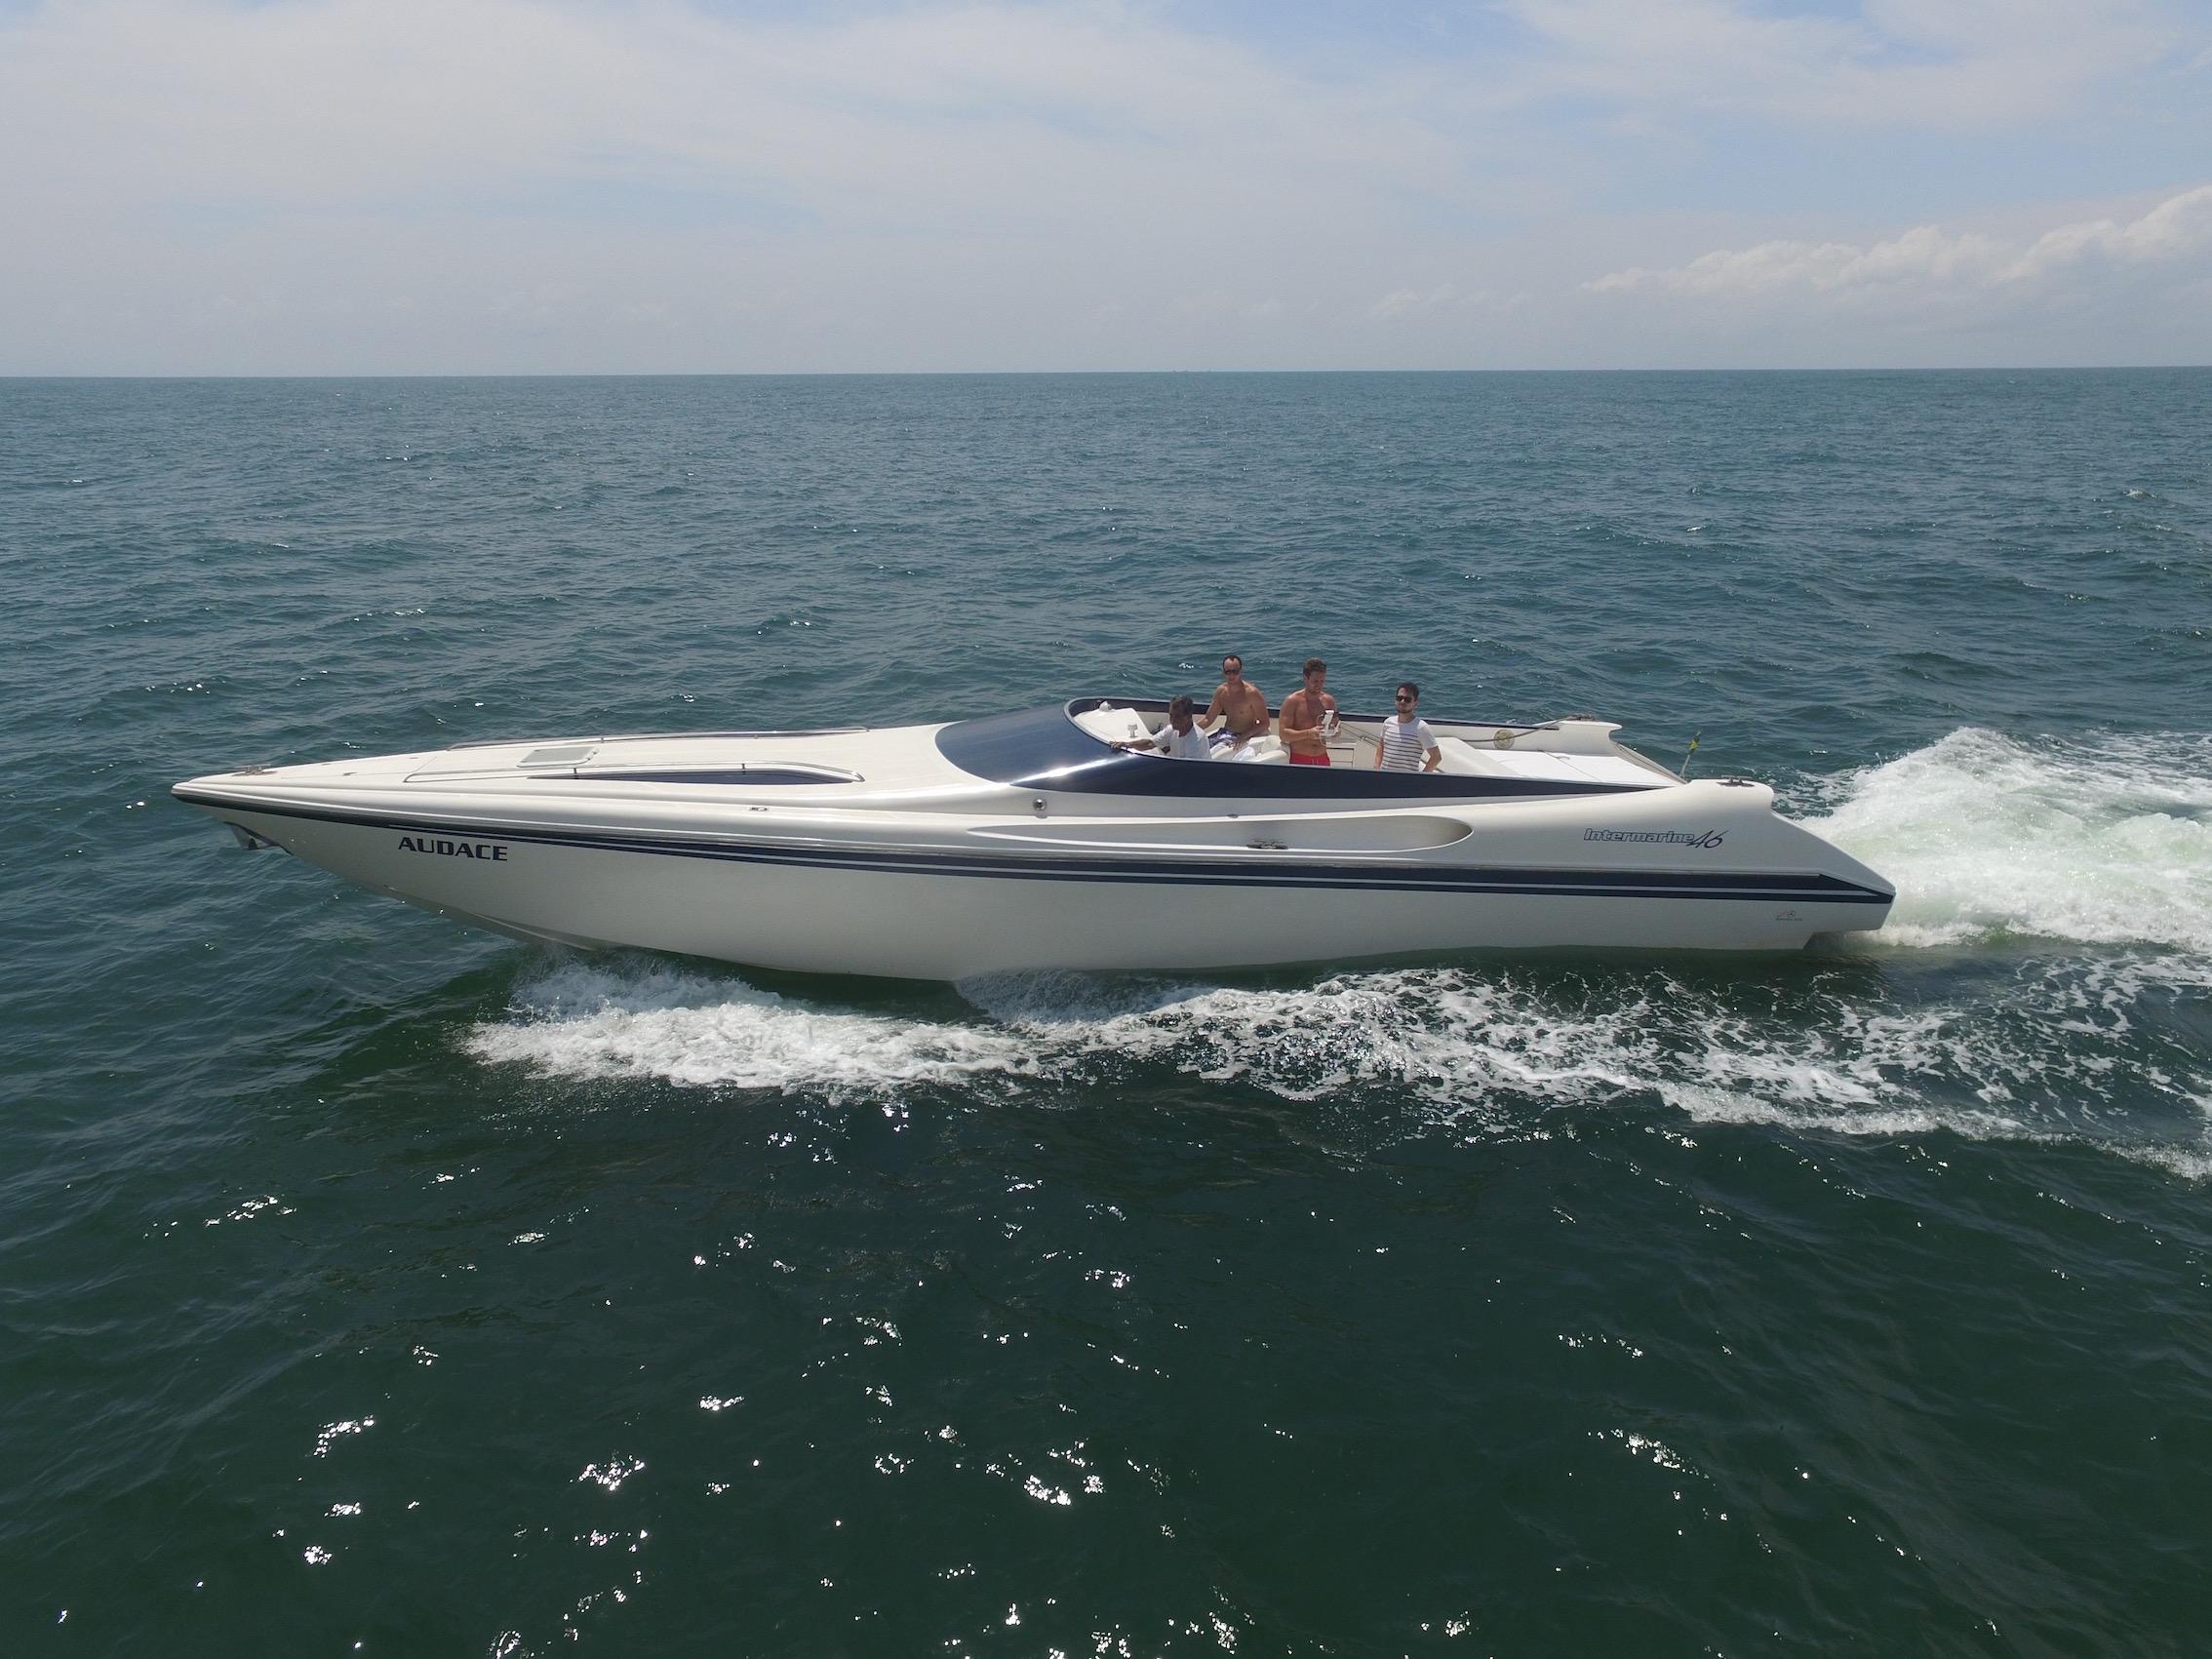 Intermarine 46 Offshore